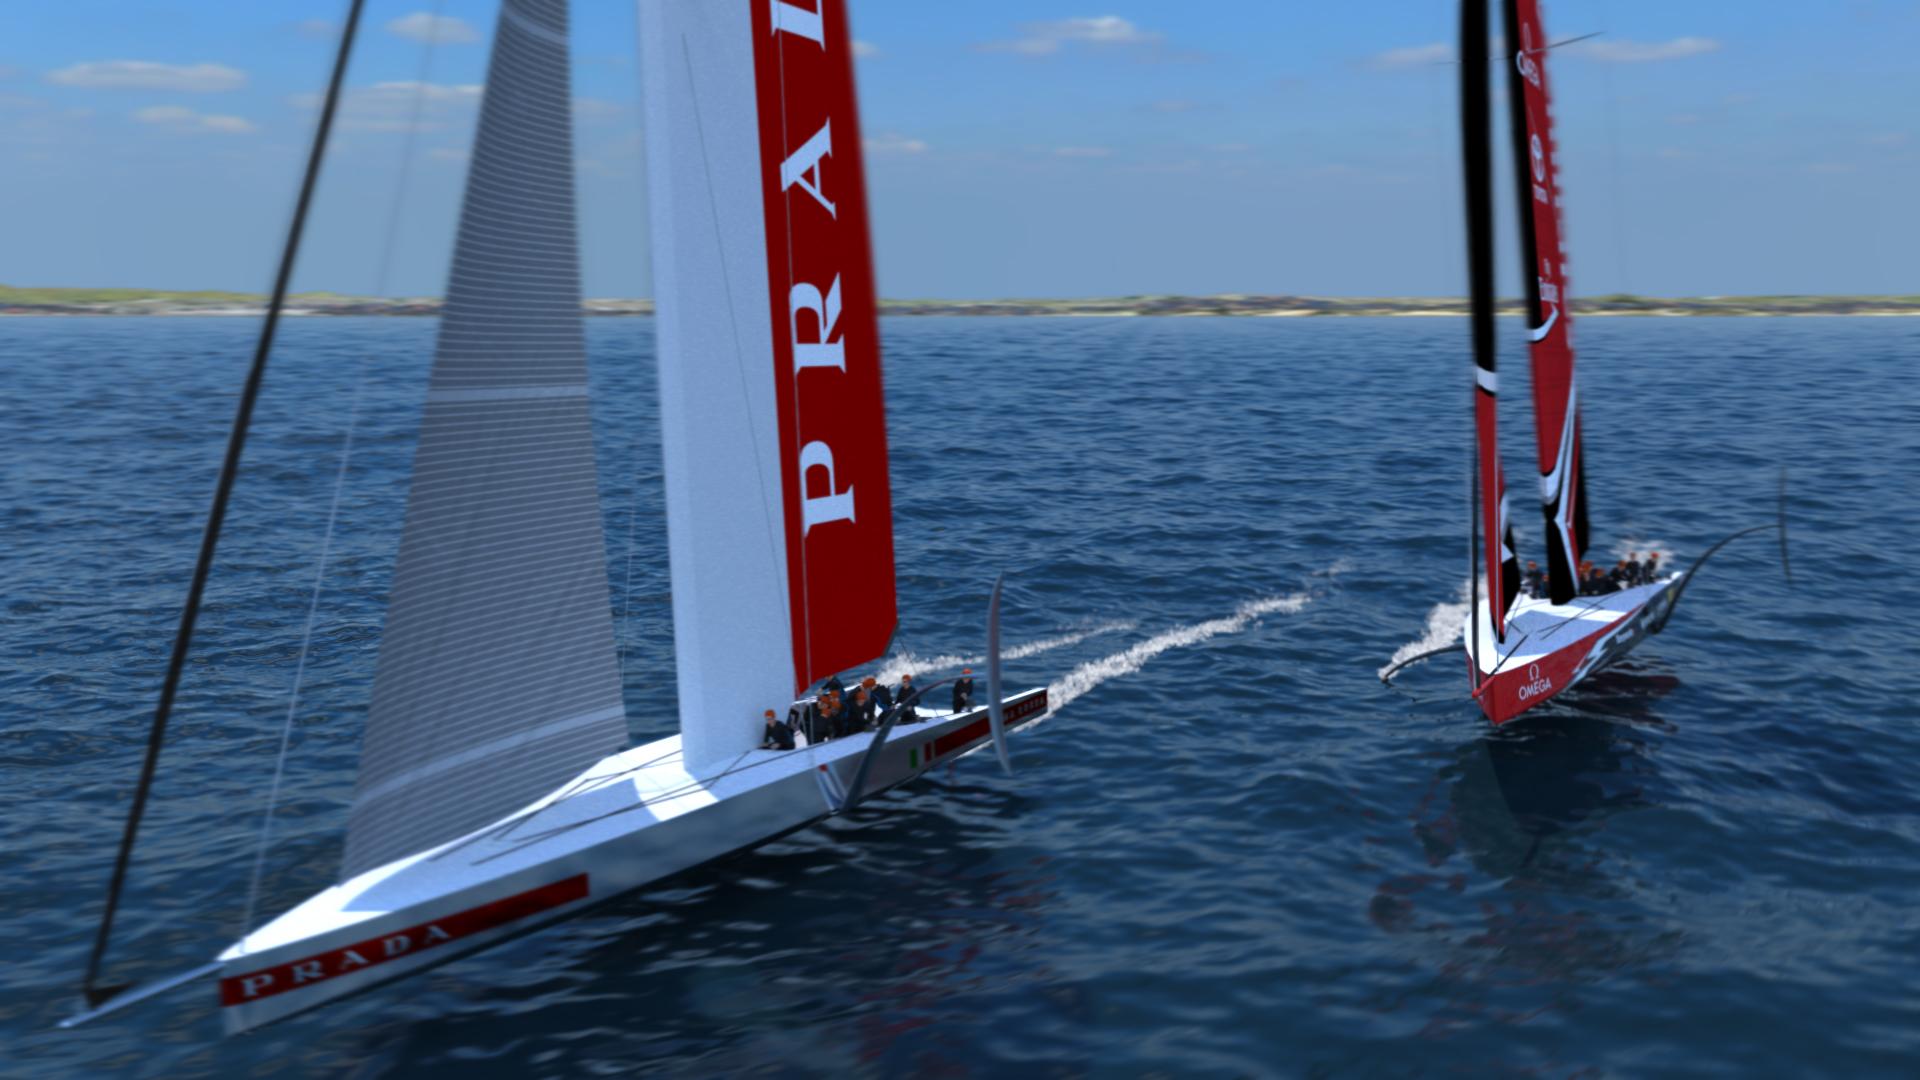 America's Cup AC75 monohull Racing Yacht catamaran